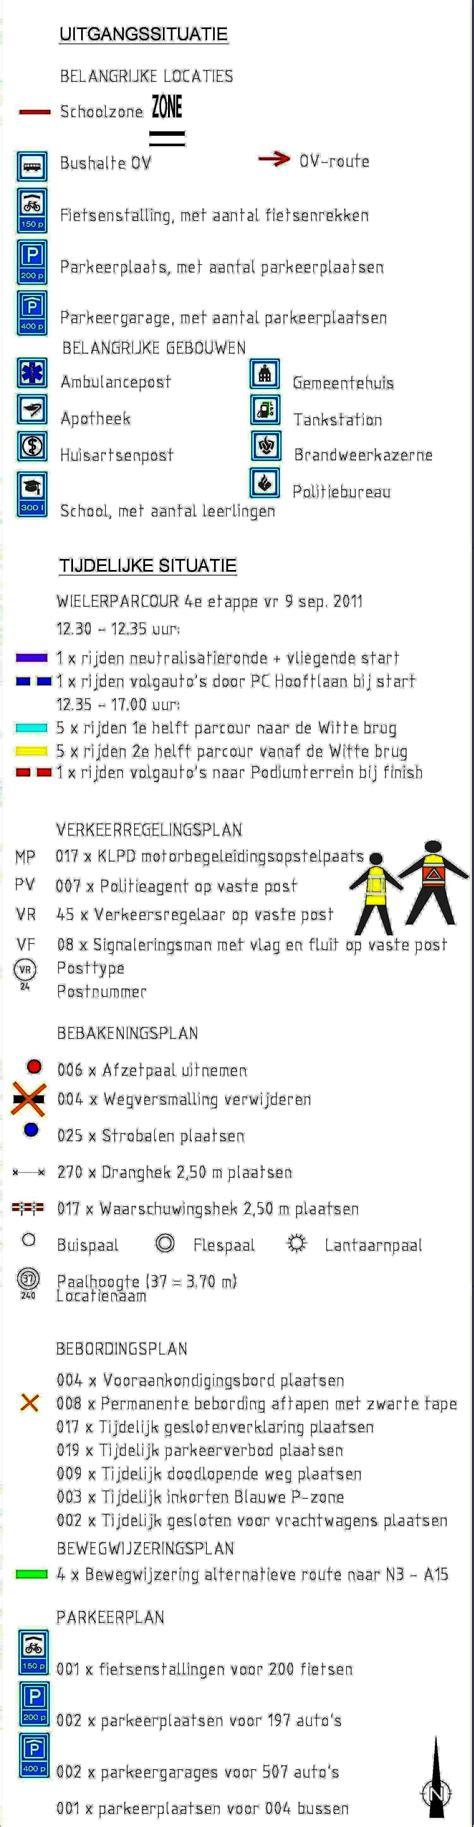 Tvm 04 Draaiboek Evenementen draaiboek 4e etappe tour 2011